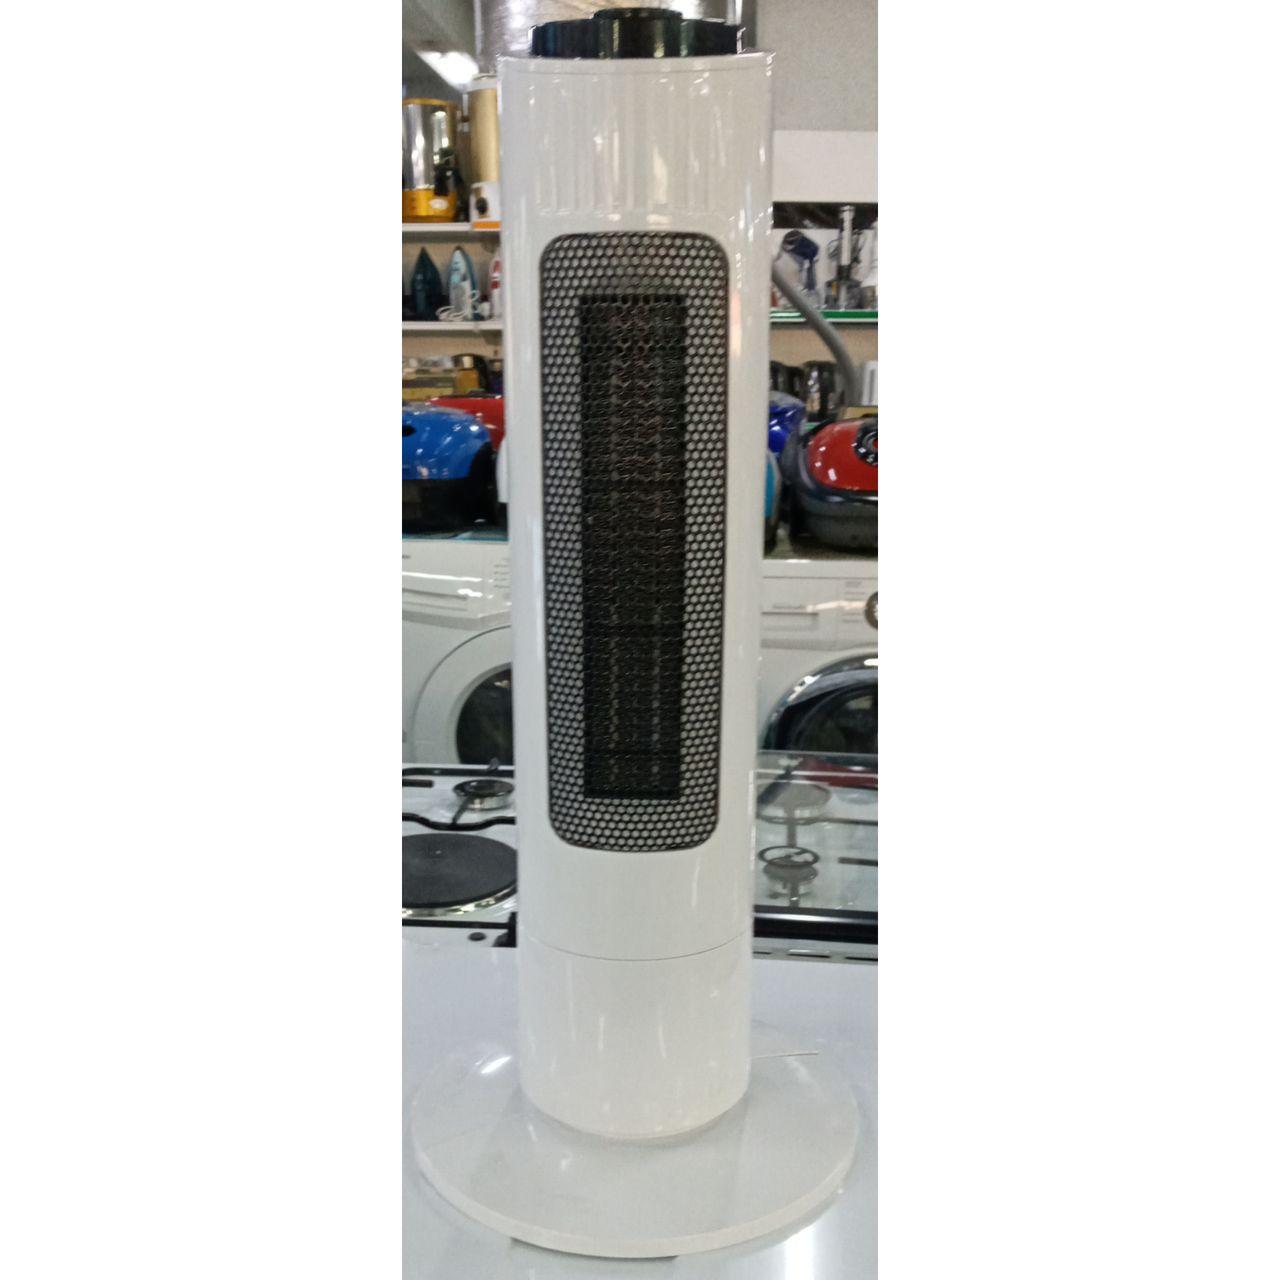 Тепловентилятор TriTower мощностью 2000 Вт